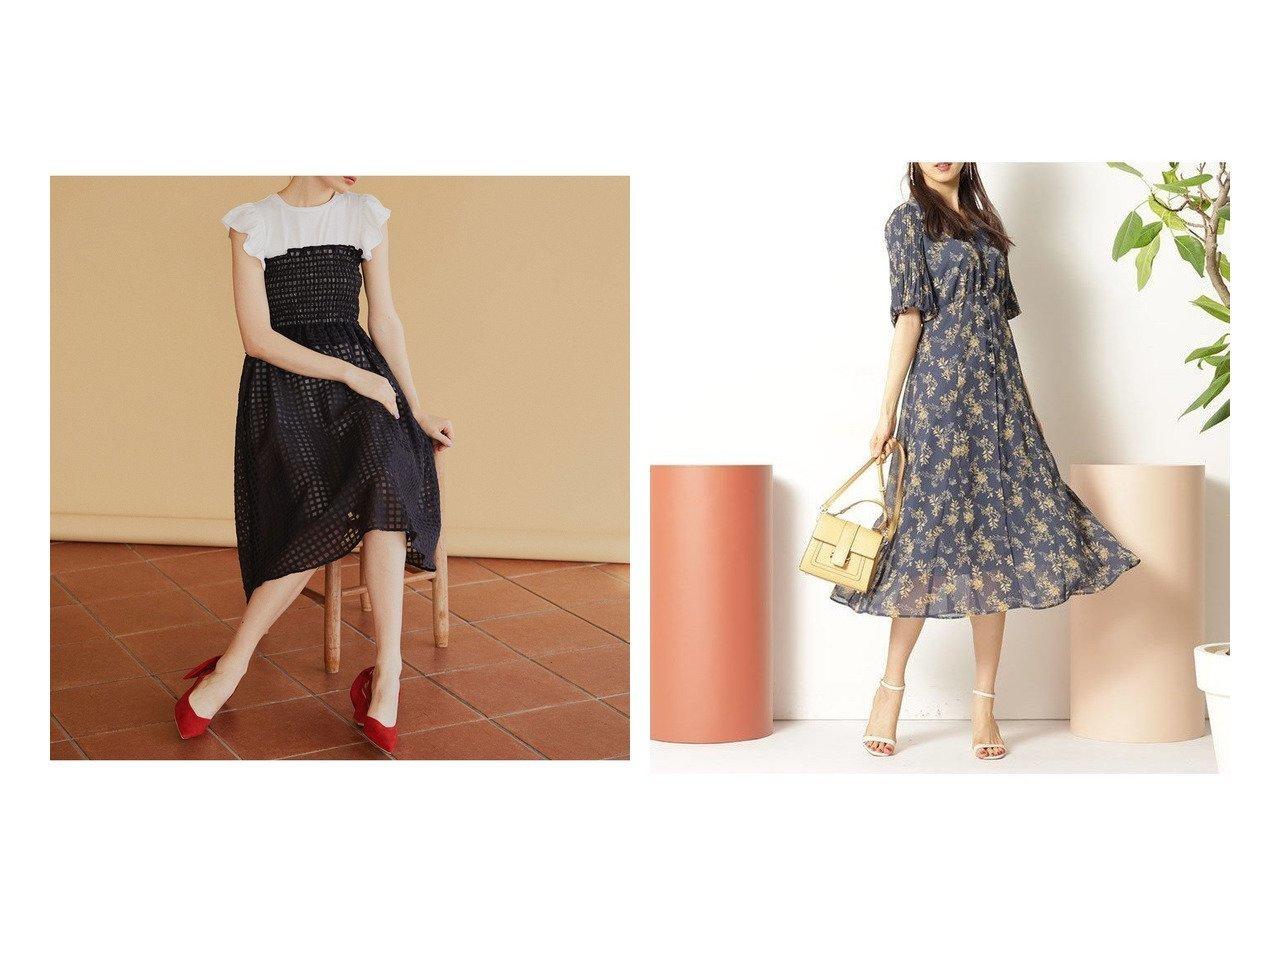 【31 Sons de mode/トランテアン ソン ドゥ モード】のTシャツ付きギンガムワンピース&【Rirandture/リランドチュール】のフラワー袖プリーツワンピース 【ワンピース・ドレス】おすすめ!人気、トレンド・レディースファッションの通販 おすすめで人気の流行・トレンド、ファッションの通販商品 メンズファッション・キッズファッション・インテリア・家具・レディースファッション・服の通販 founy(ファニー) https://founy.com/ ファッション Fashion レディースファッション WOMEN ワンピース Dress NEW・新作・新着・新入荷 New Arrivals フラワー プリーツ 2021年 2021 2021春夏・S/S SS/Spring/Summer/2021 S/S・春夏 SS・Spring/Summer インナー エアリー ガーリー ギンガム シャーリング スリーブ チェック バランス フィット フリル フレンチ |ID:crp329100000029854